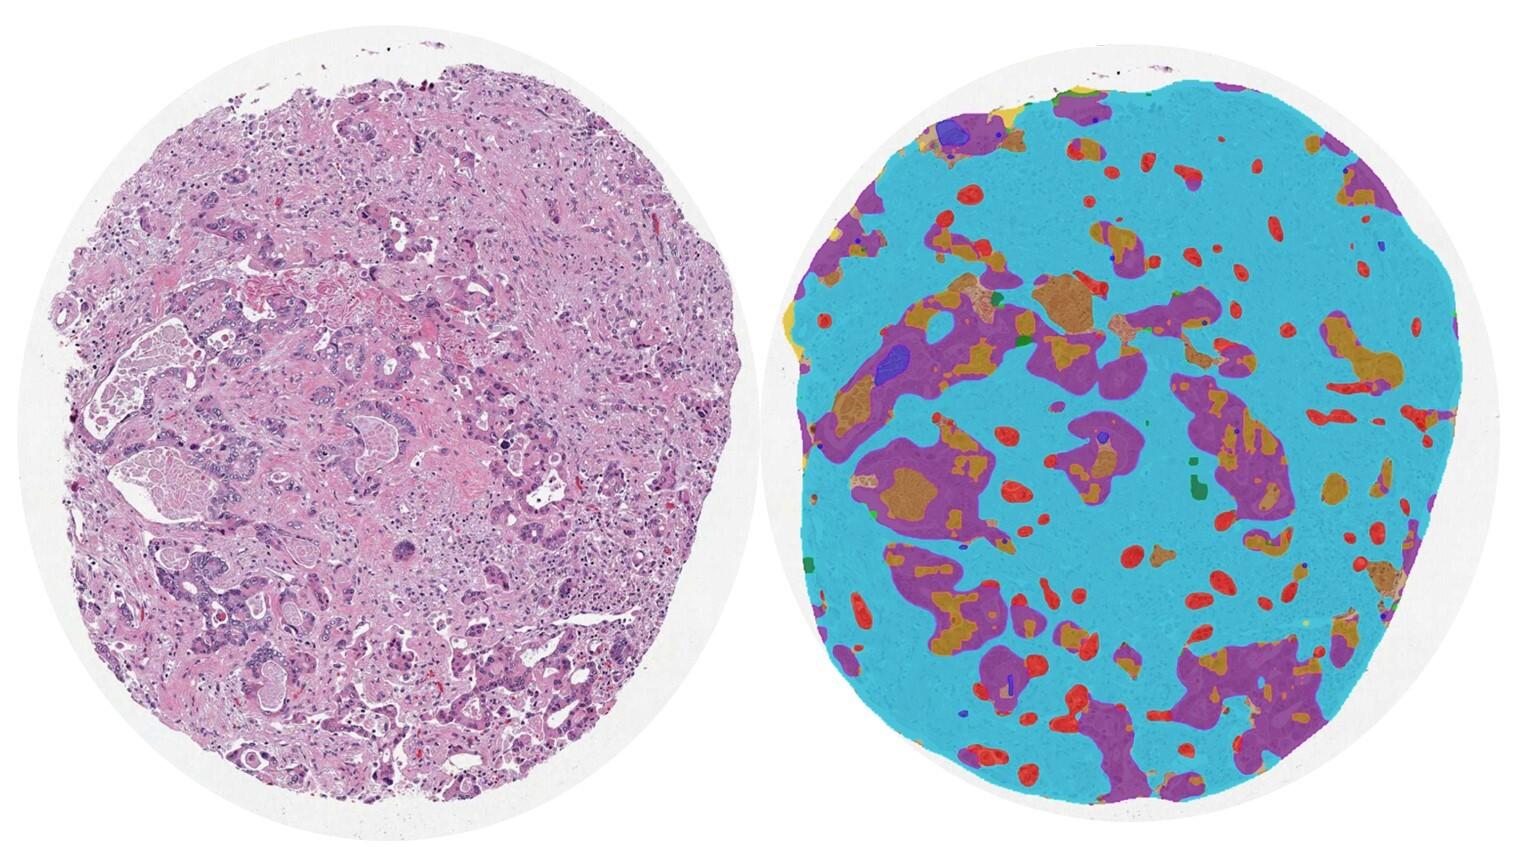 Leveraging AI-driven quantitative pathology to identity novel prognostic histologic signatures in colorectal carcinoma